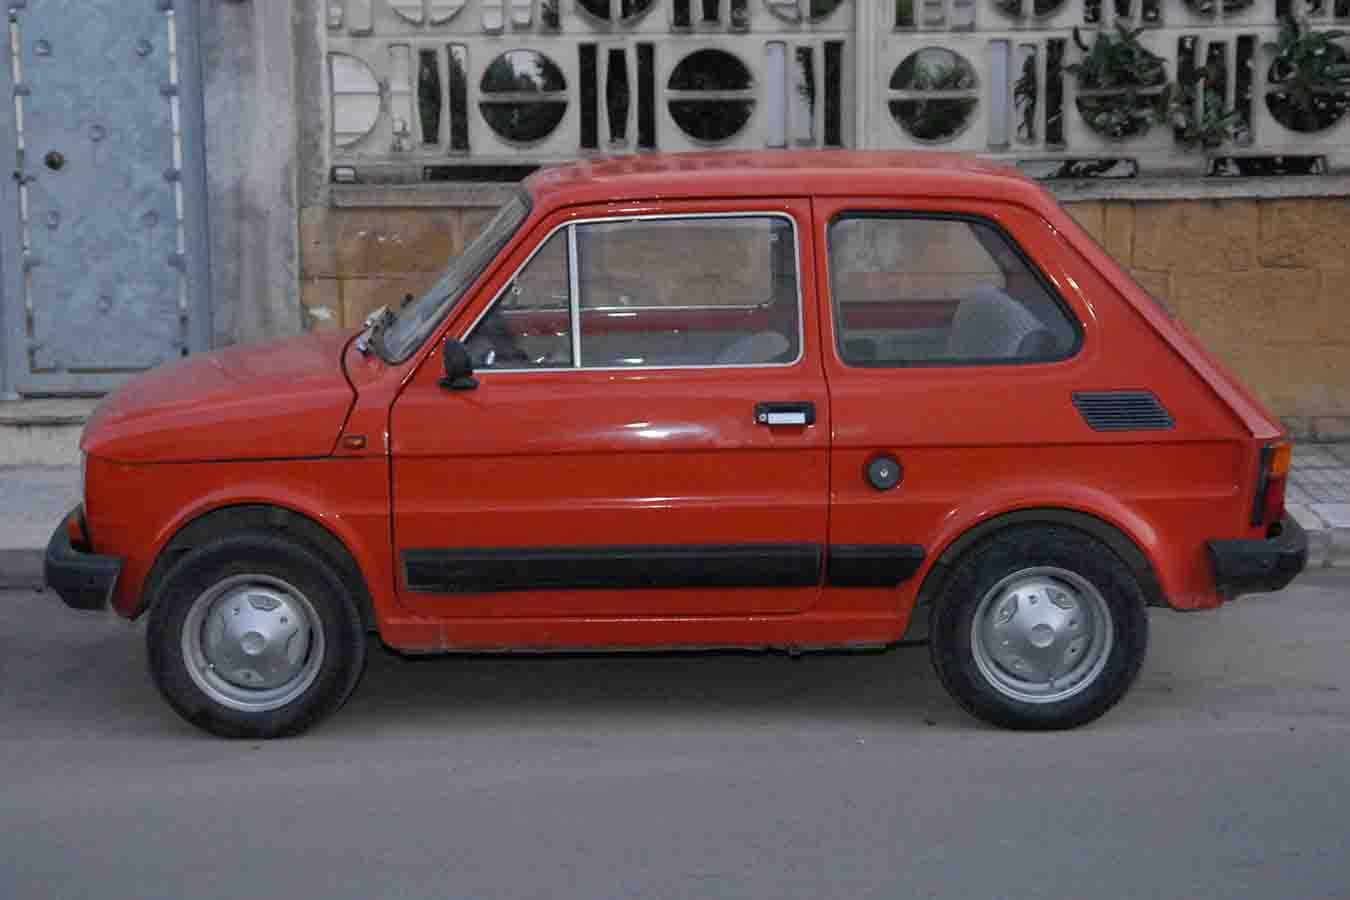 fiat 1100 tv vendo with Vendo Fiat 126 Prima Serie Brindisi 66945 on Fiat 600 Motor 128 furthermore 6 moreover Info as well Vendo fiat 126 prima serie brindisi 66945 moreover 97763365.